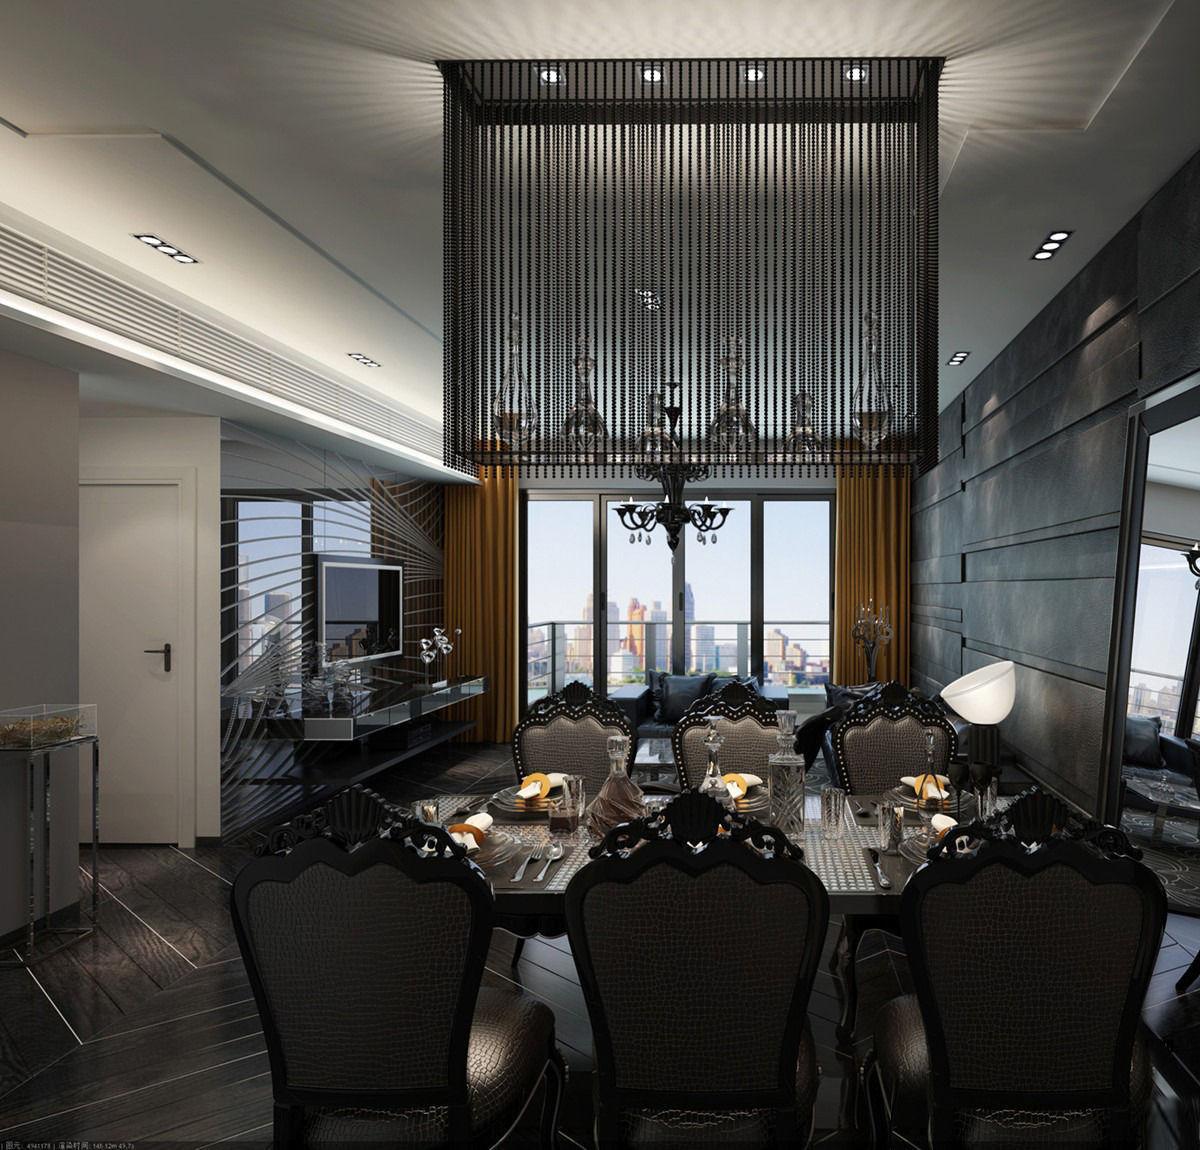 Realistic Dining Room Design 038 3d Model Max